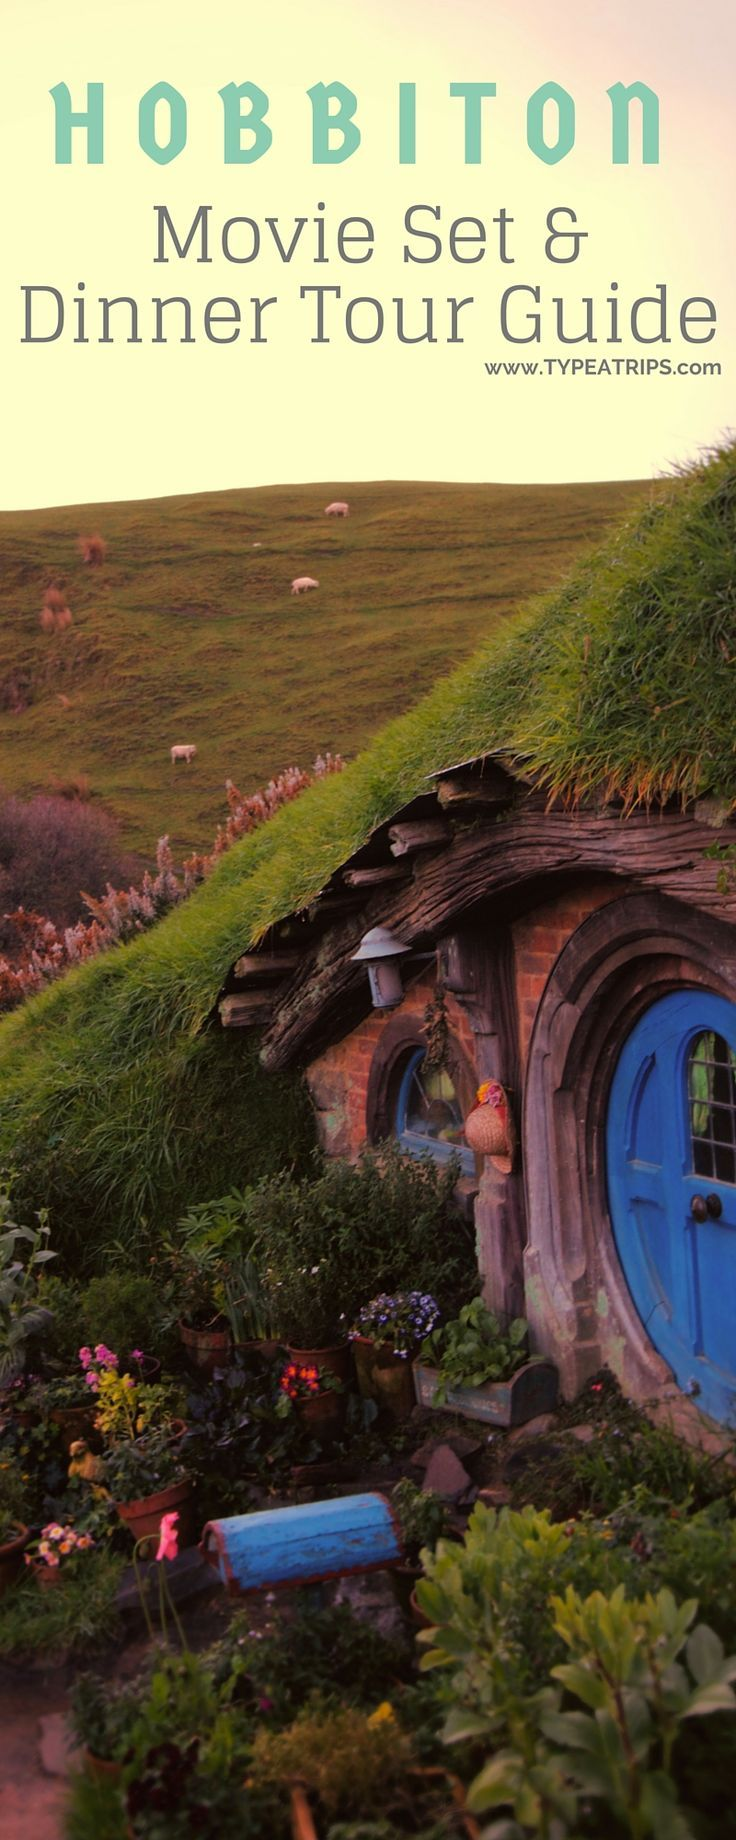 Hobbiton Evening Dinner Tours A Night